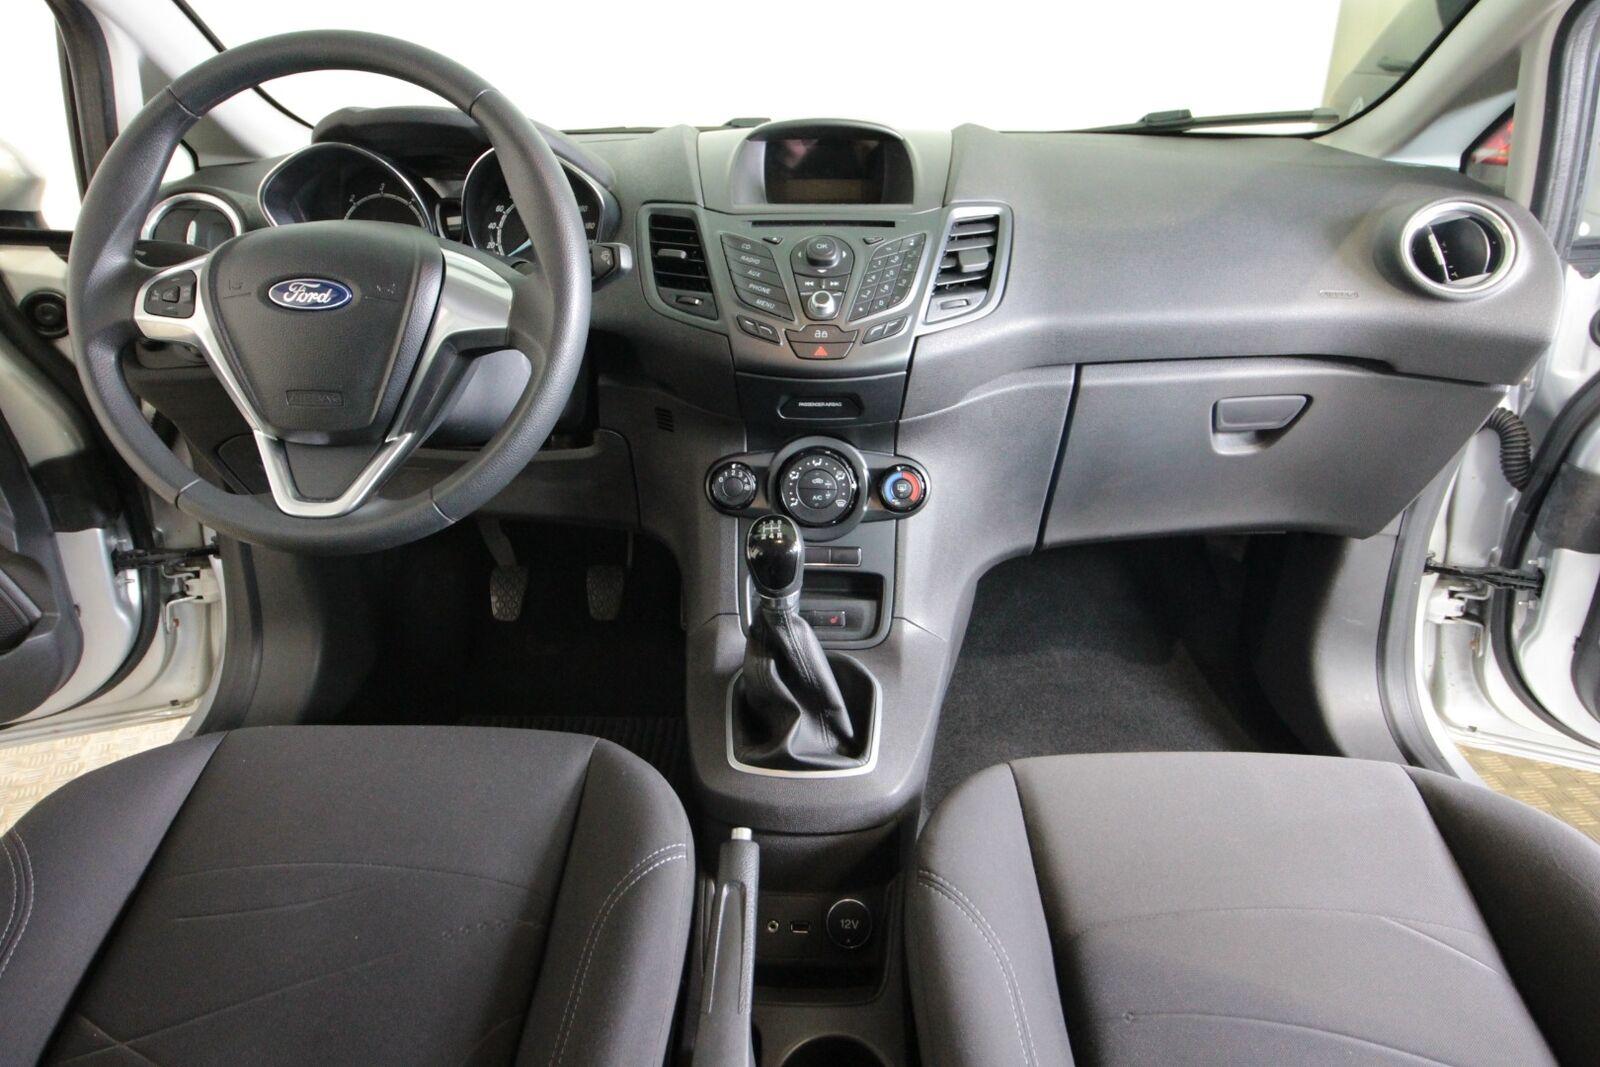 Ford Fiesta TDCi 95 Trend ECO